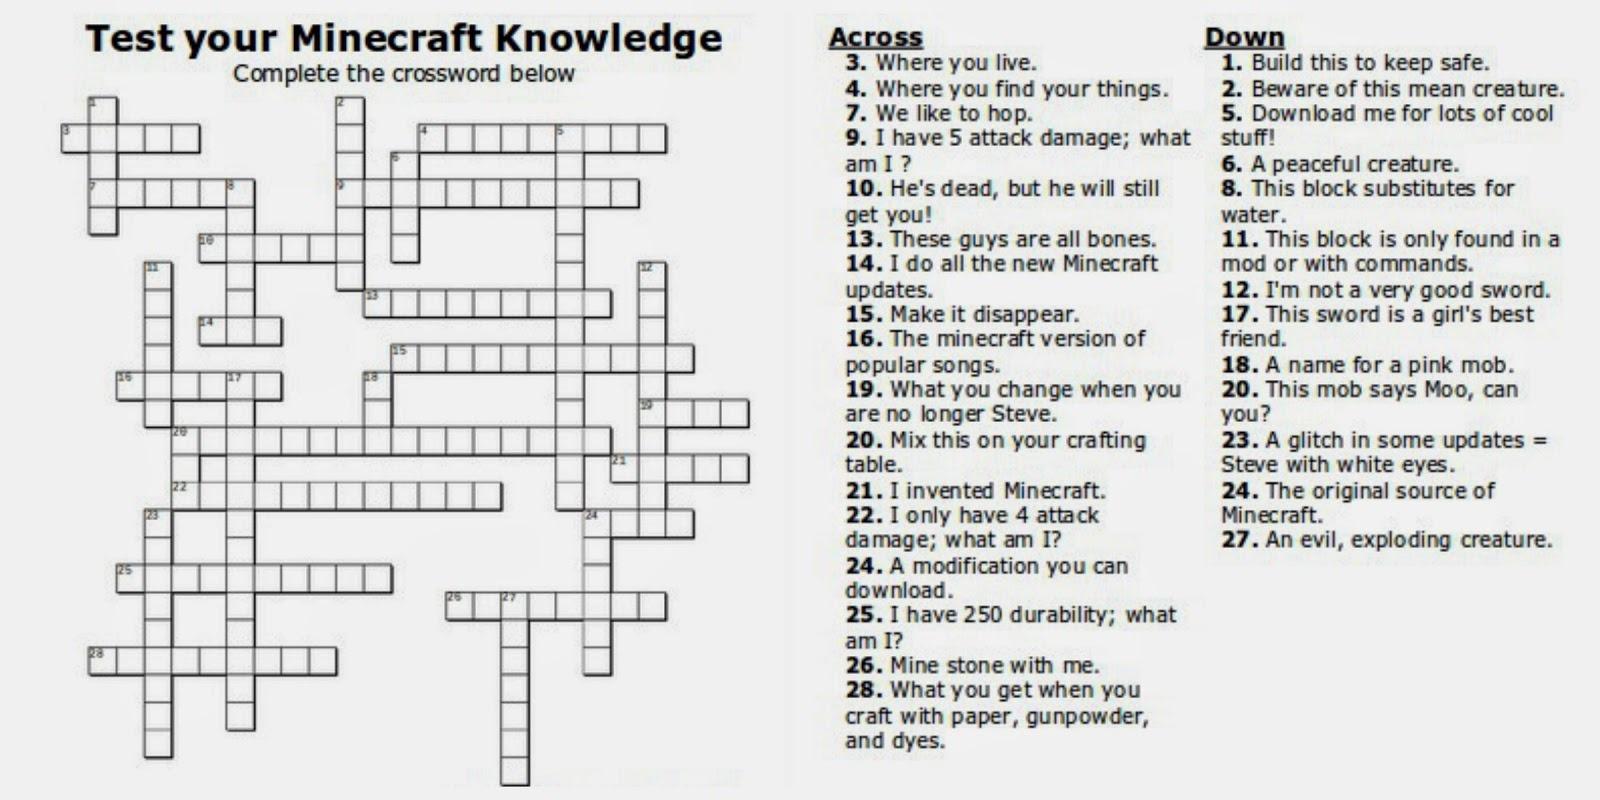 Free Printable Minecraft Crossword Search: Test Your Minecraft - Free Printable Crossword Puzzles For Kids